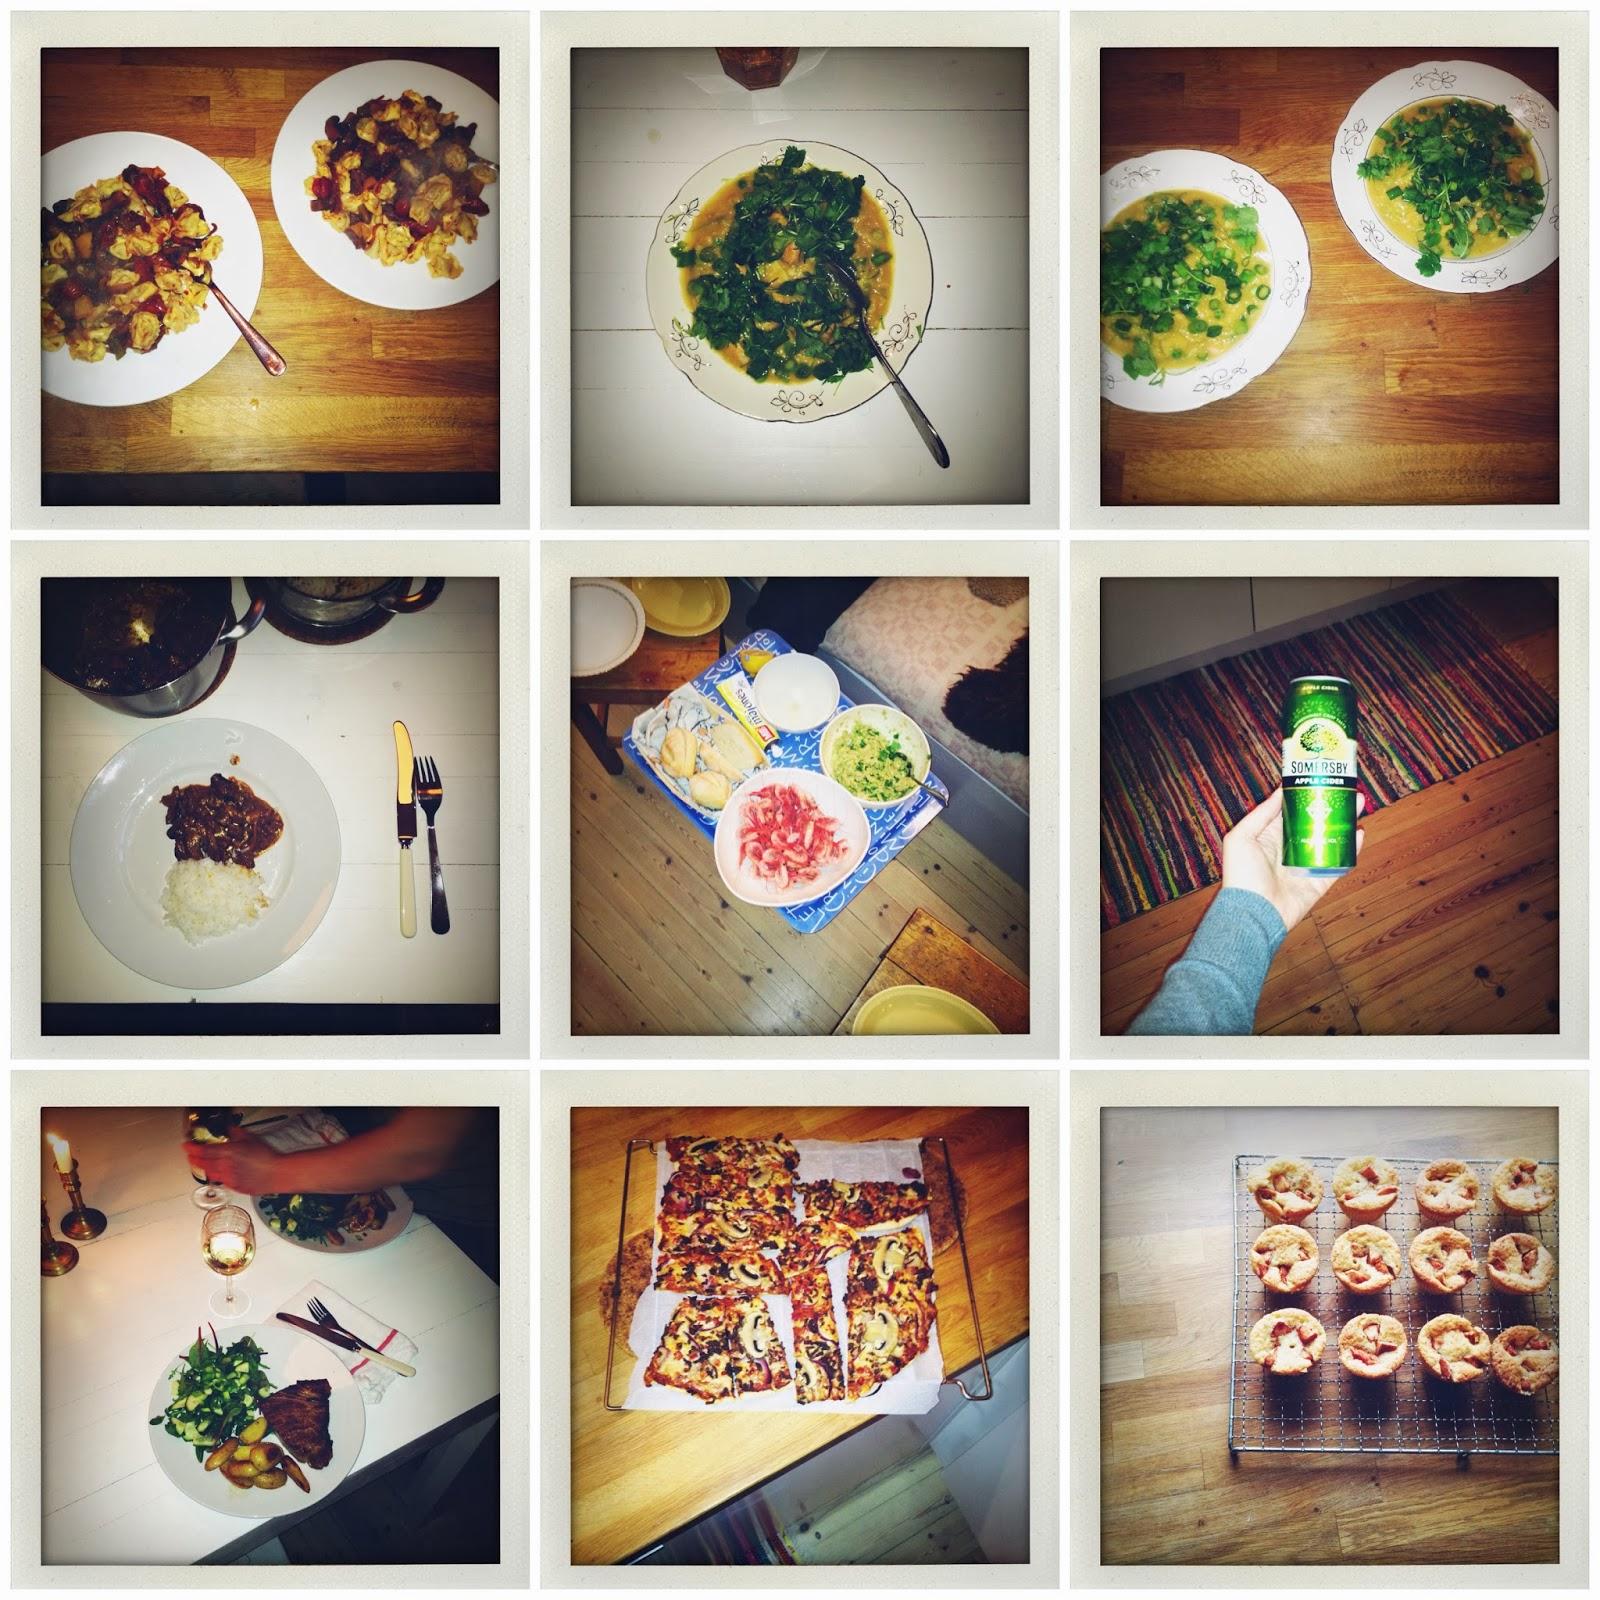 extra, gourmetice, astrid, hei, projeto, fotografia, jantar, what's for dinner